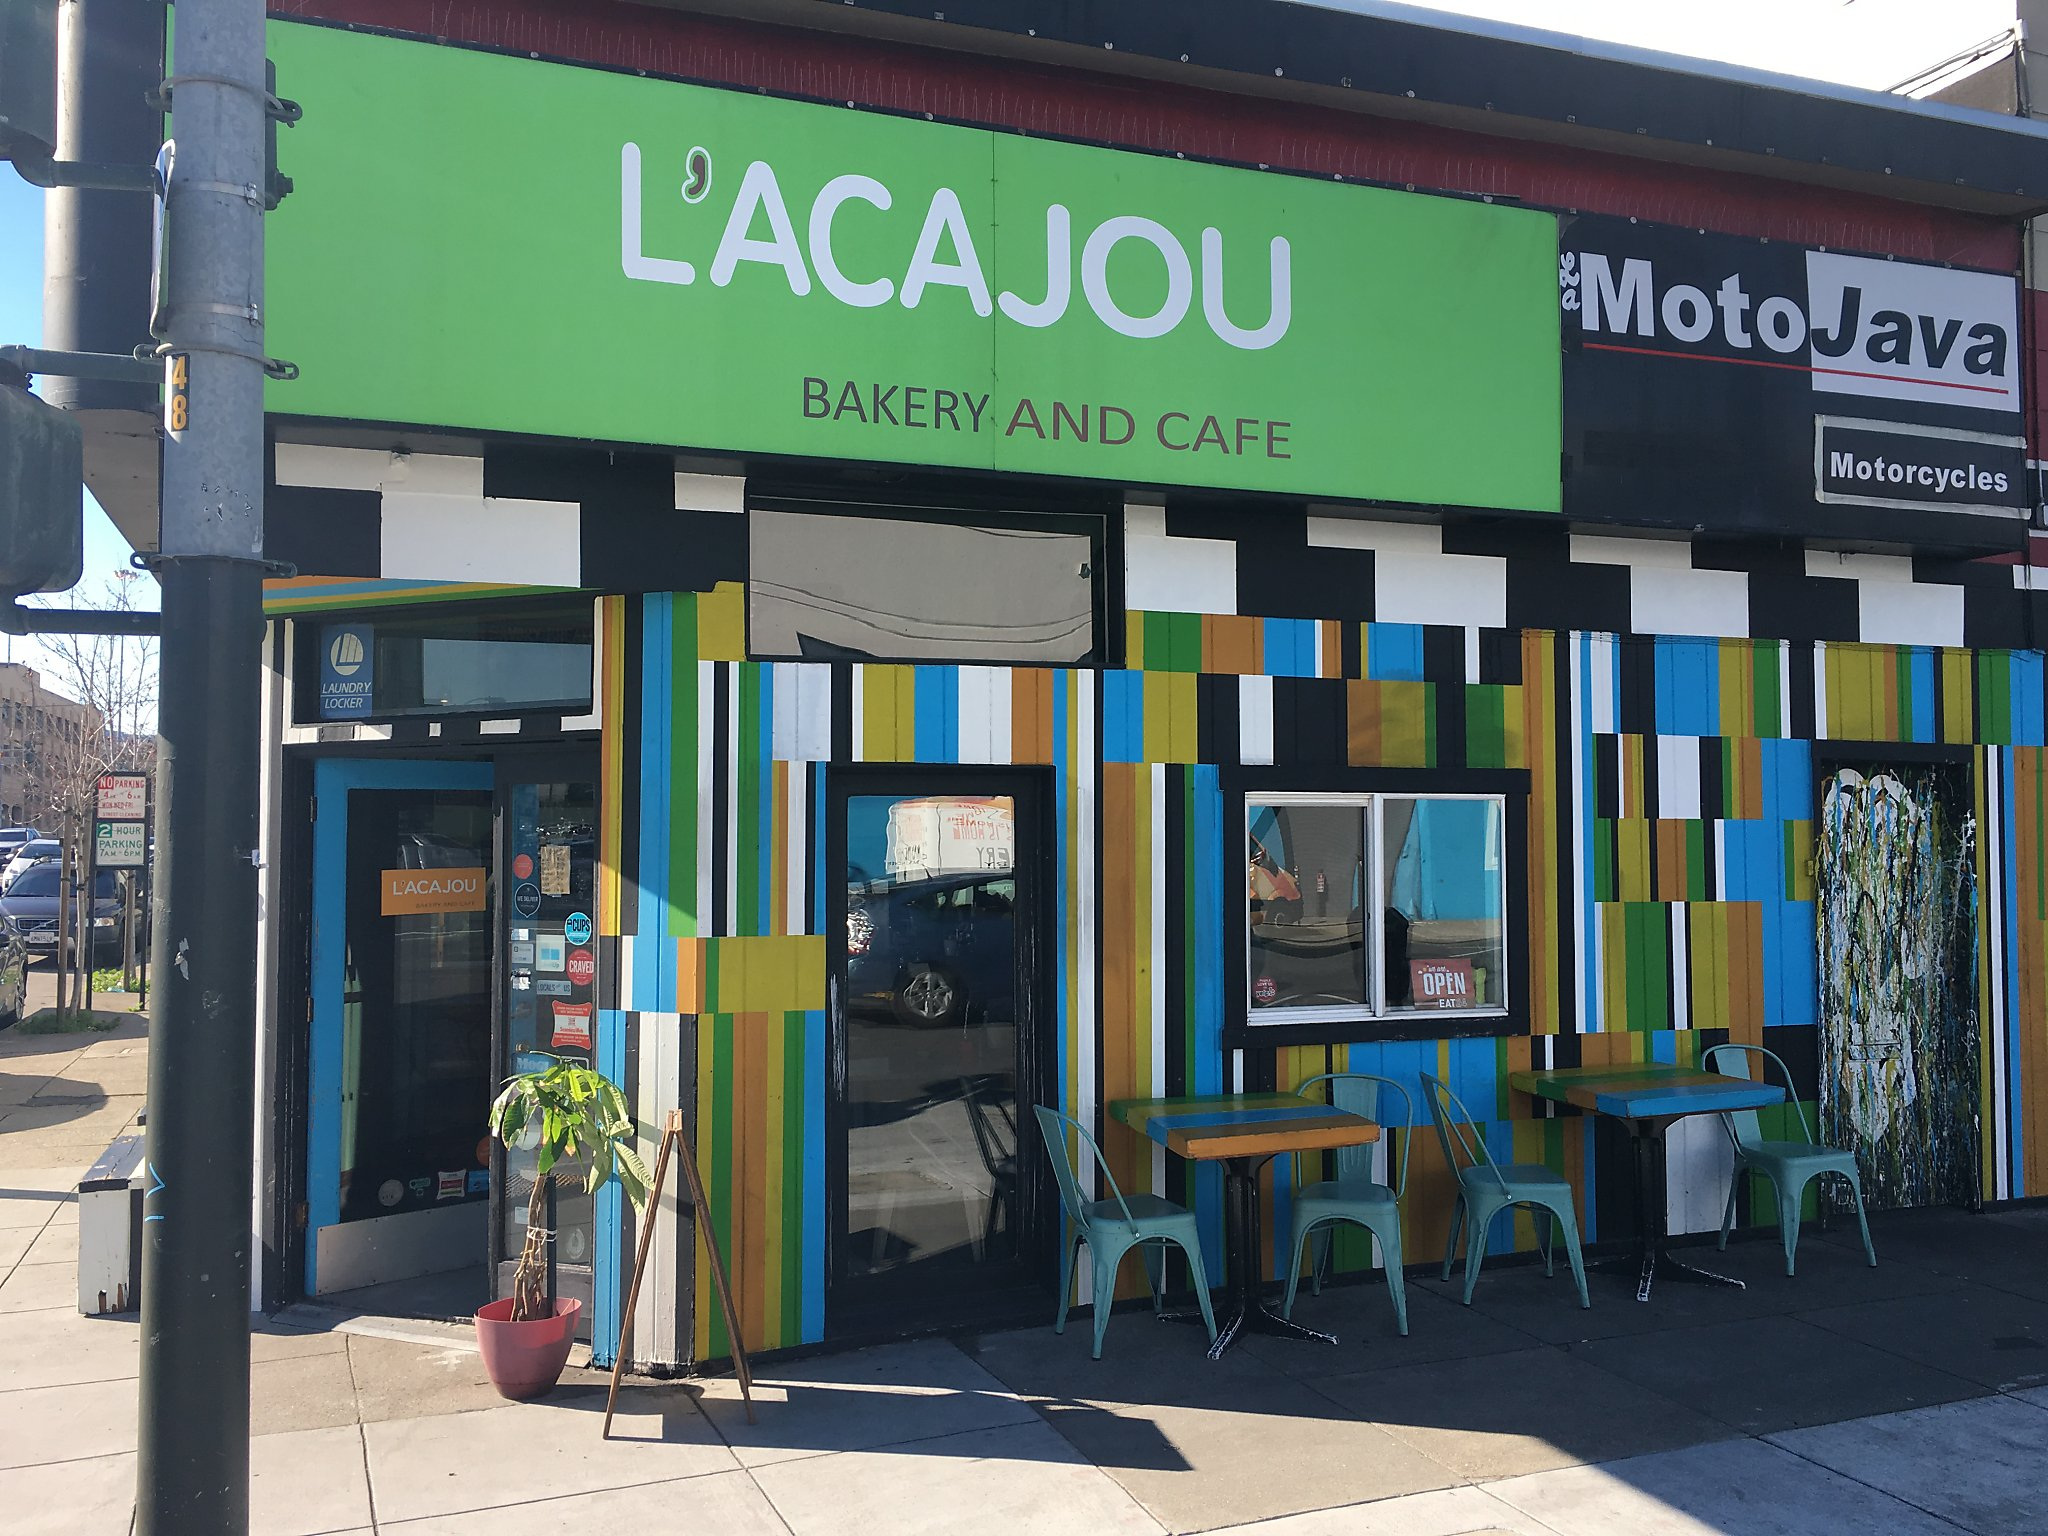 SoMa bakery L'Acajou to open new Oakland outpost